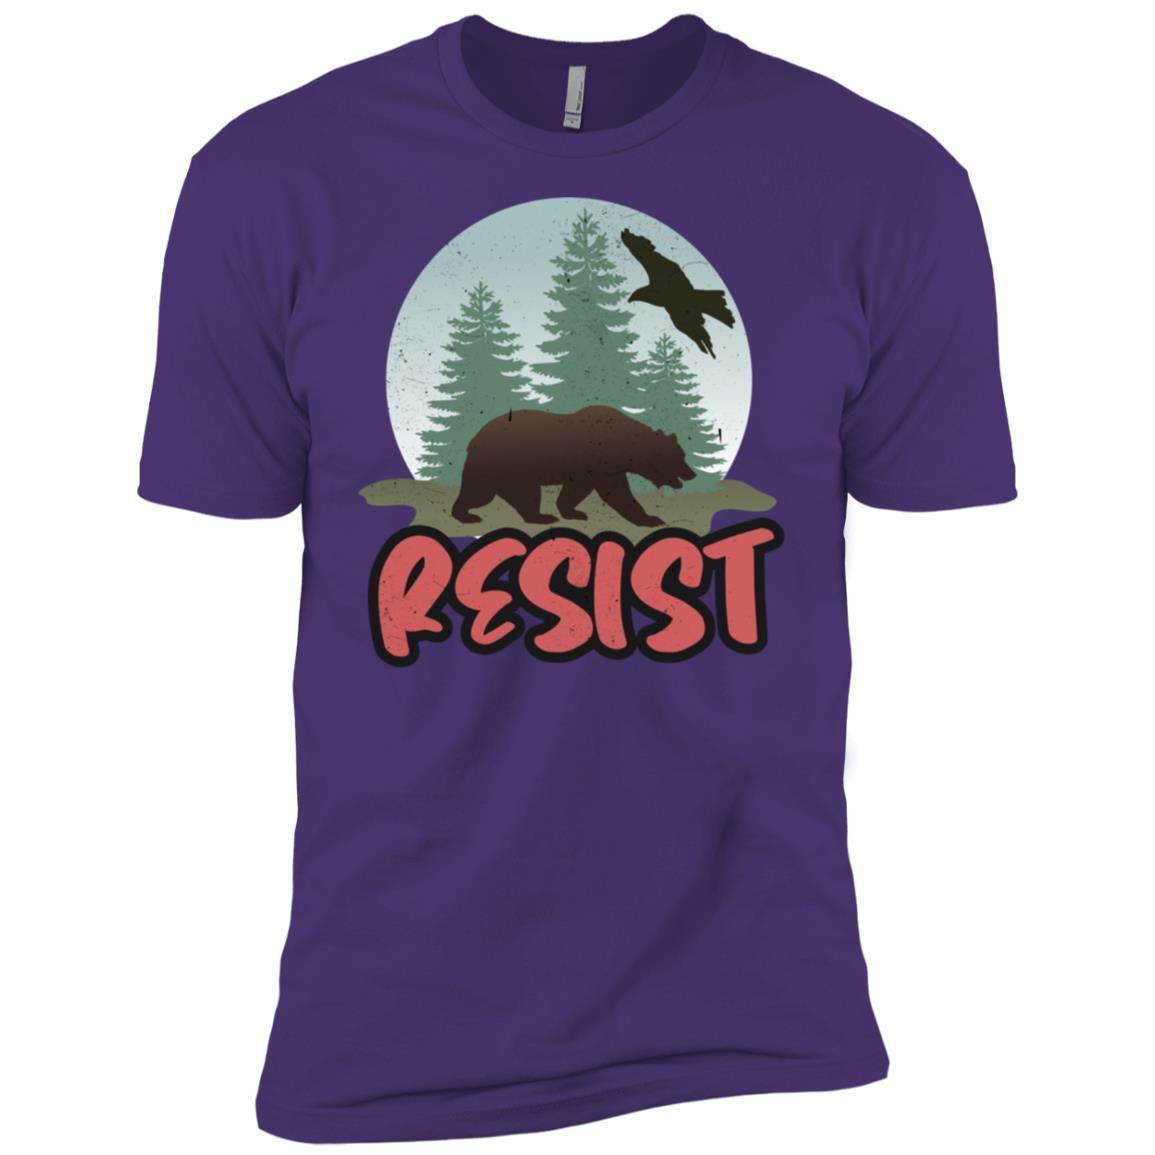 Resist Alt Us National Parks Resist Graphic Bear Tee Men Short Sleeve T-Shirt